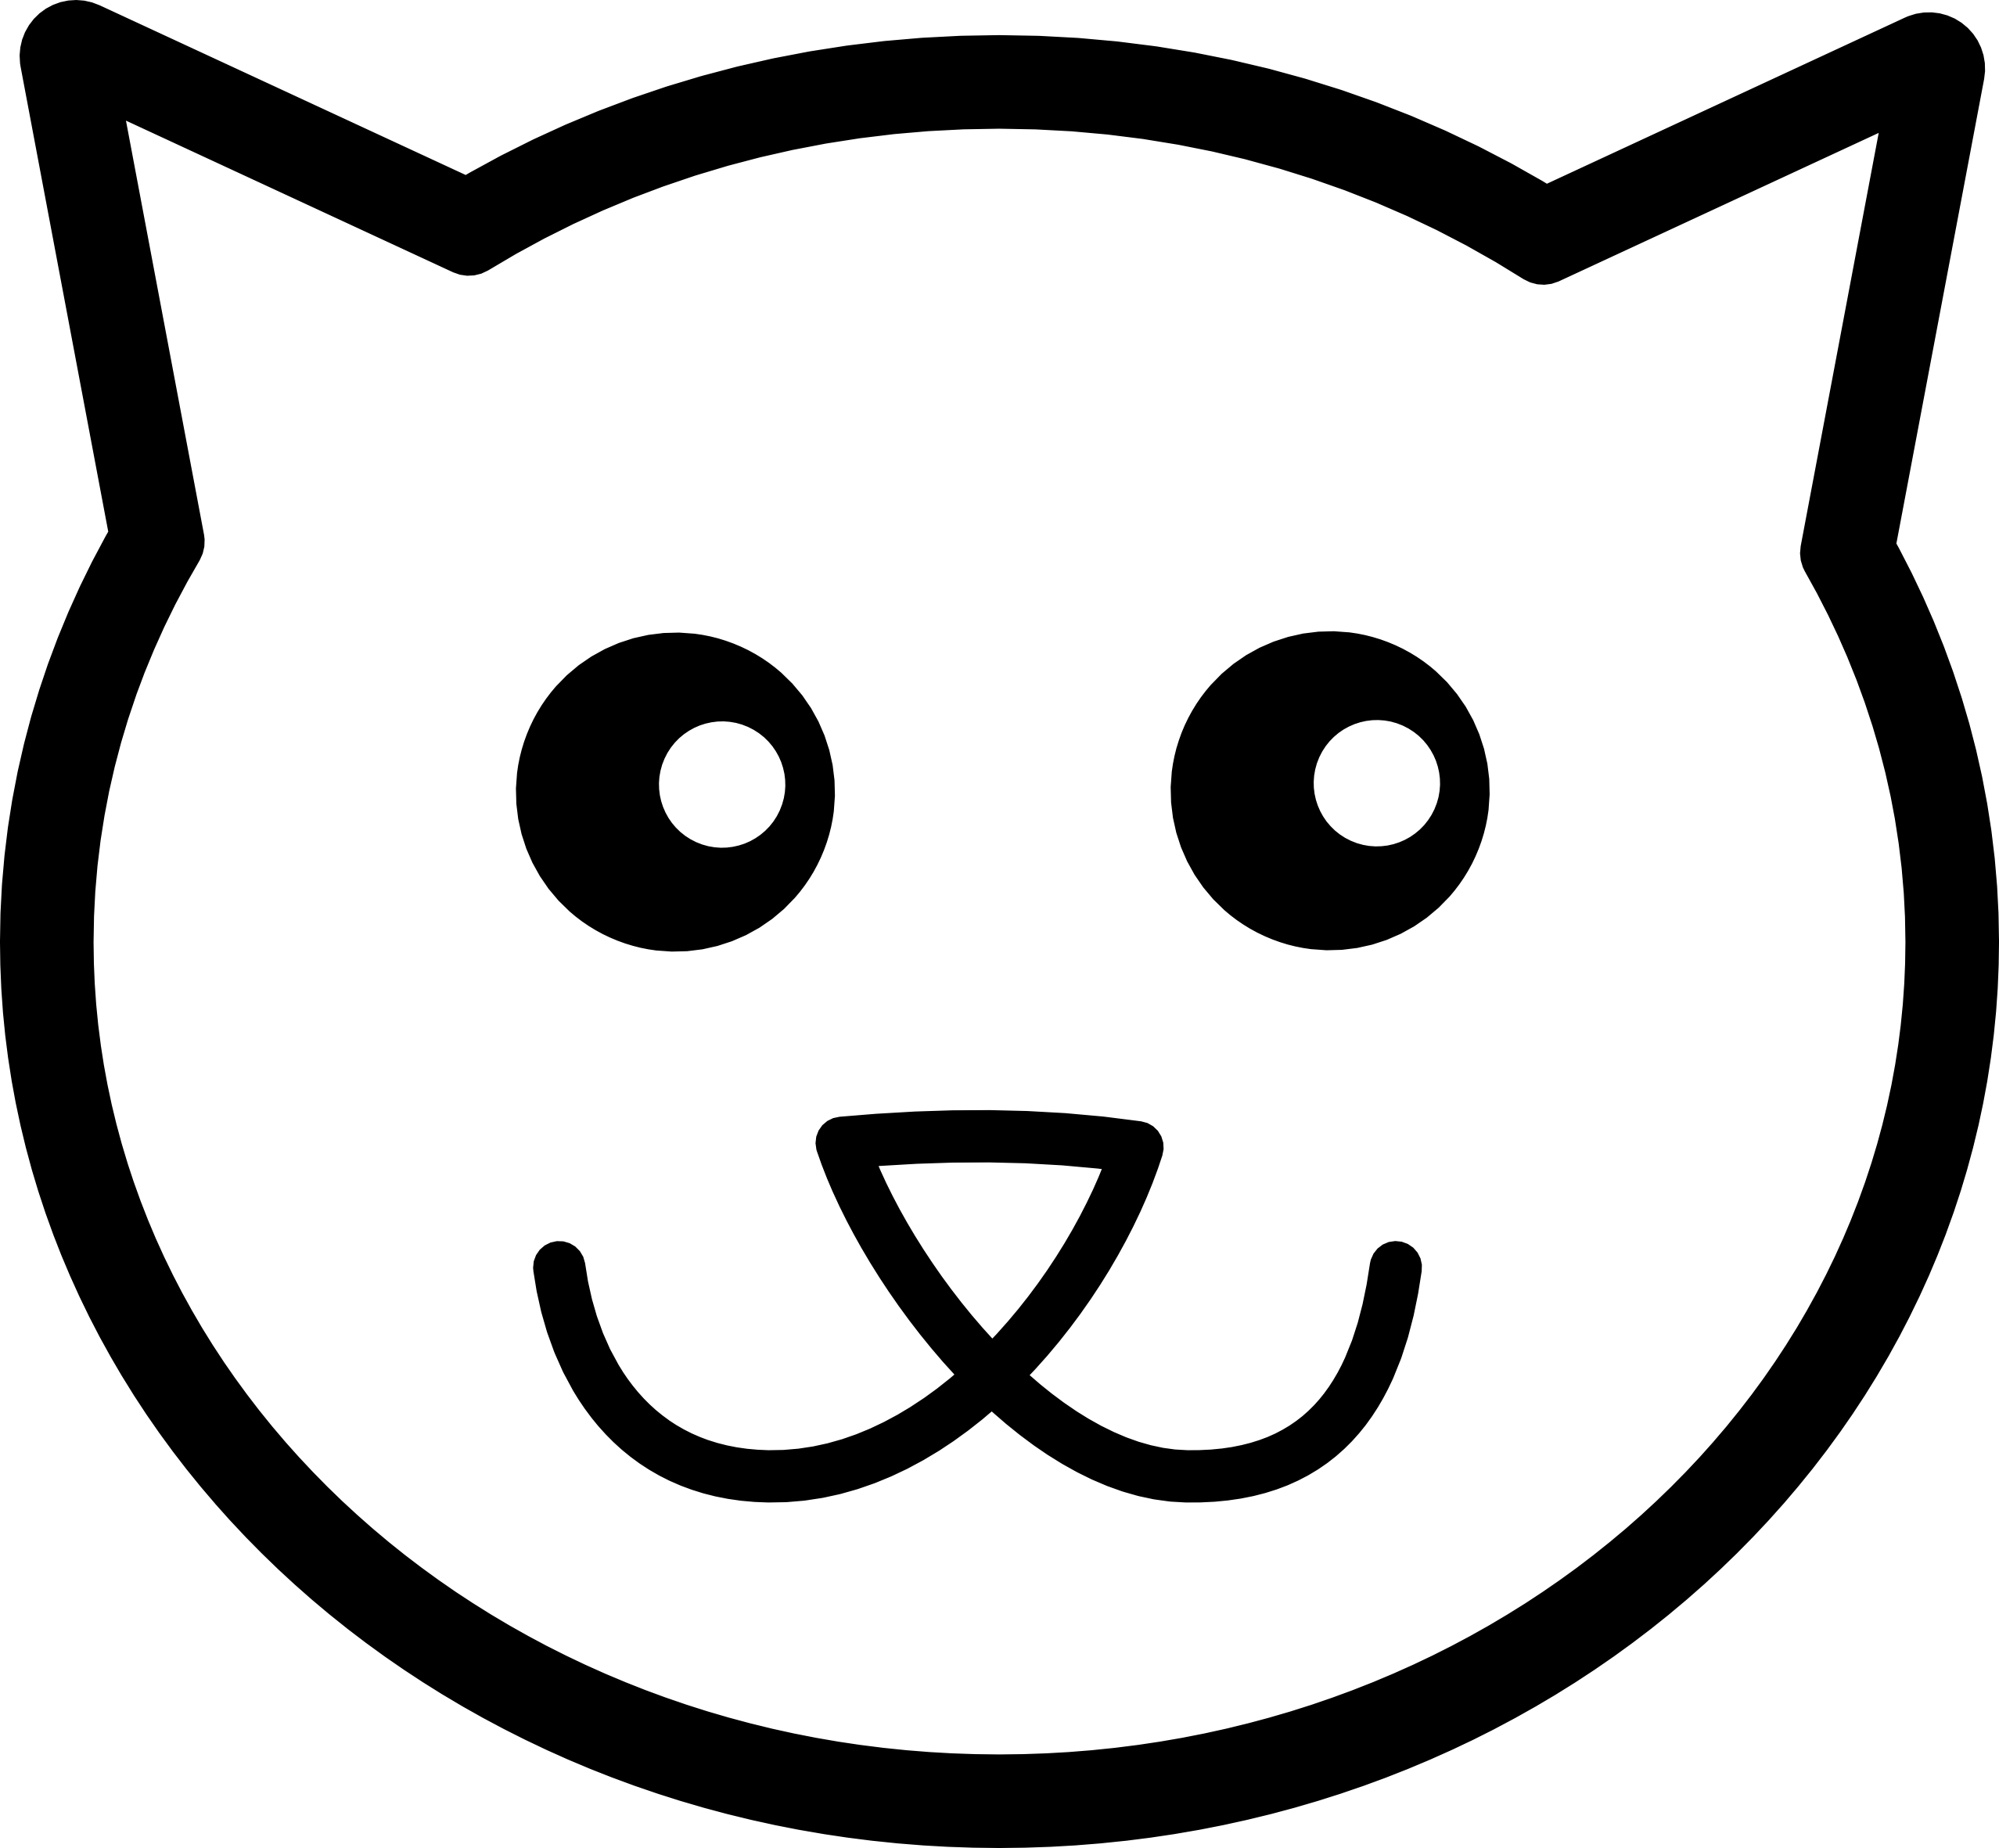 Line Art Icon : Cello clipart black and white panda free